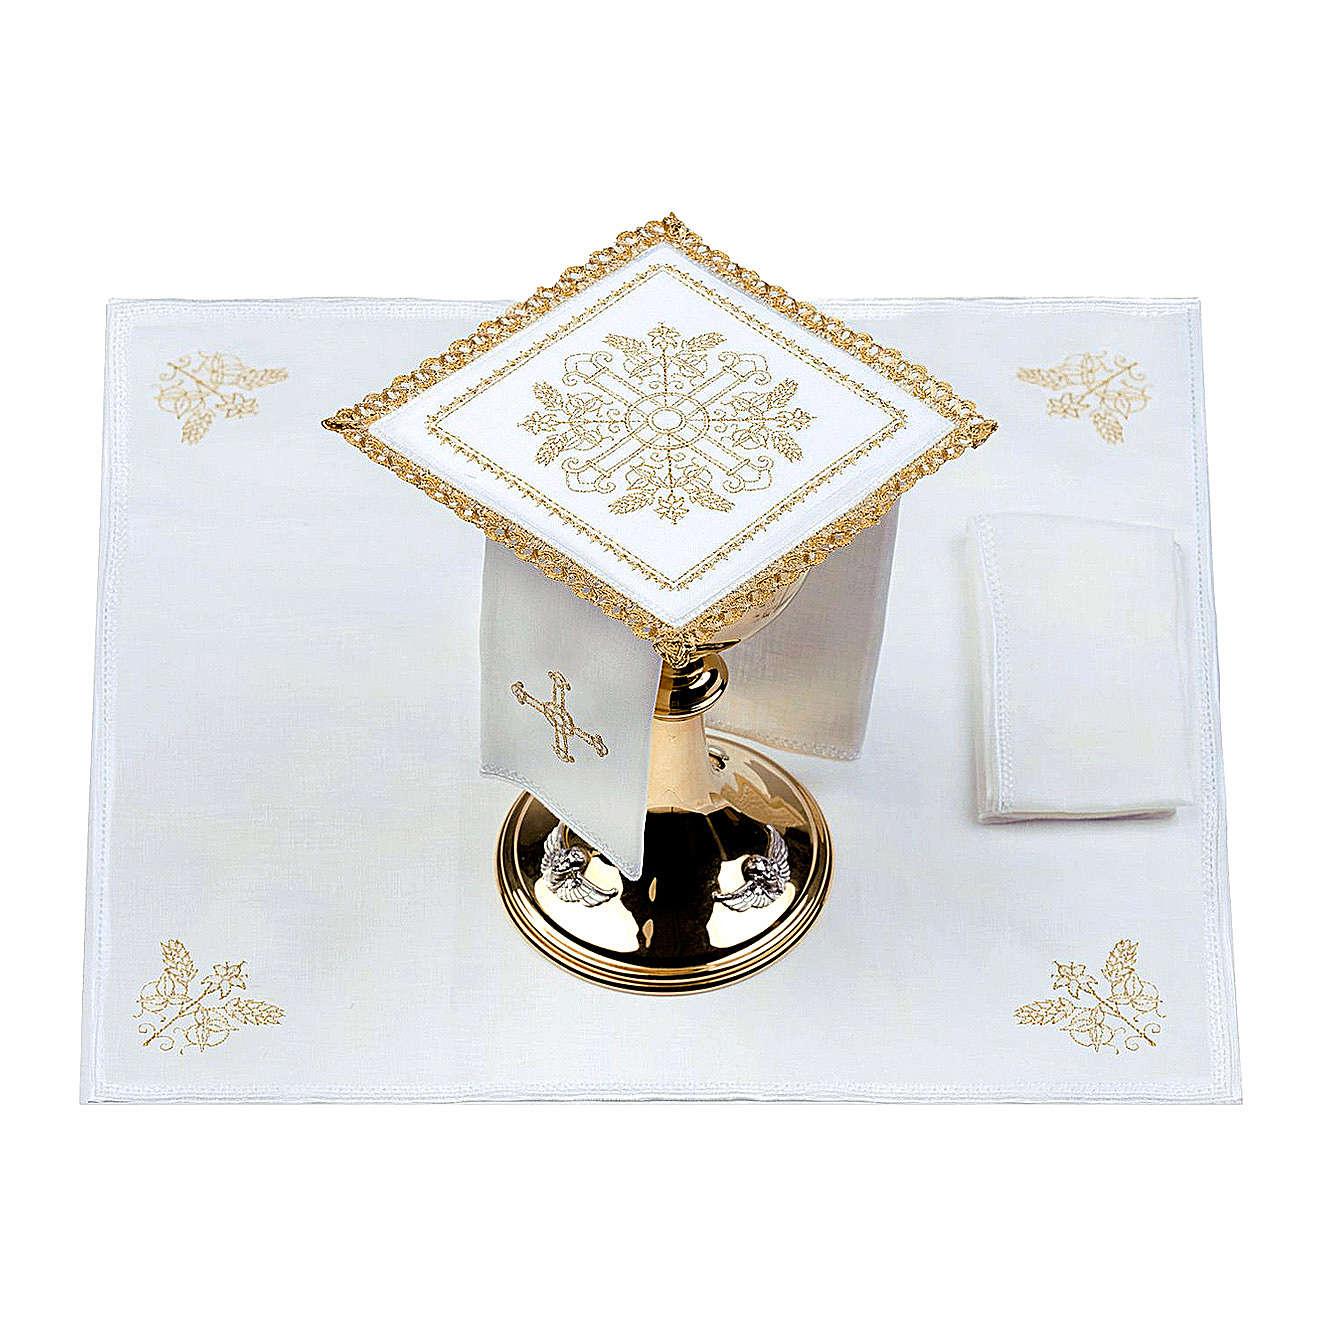 Servicio de altar 100% hilo Cruces con espigas 4